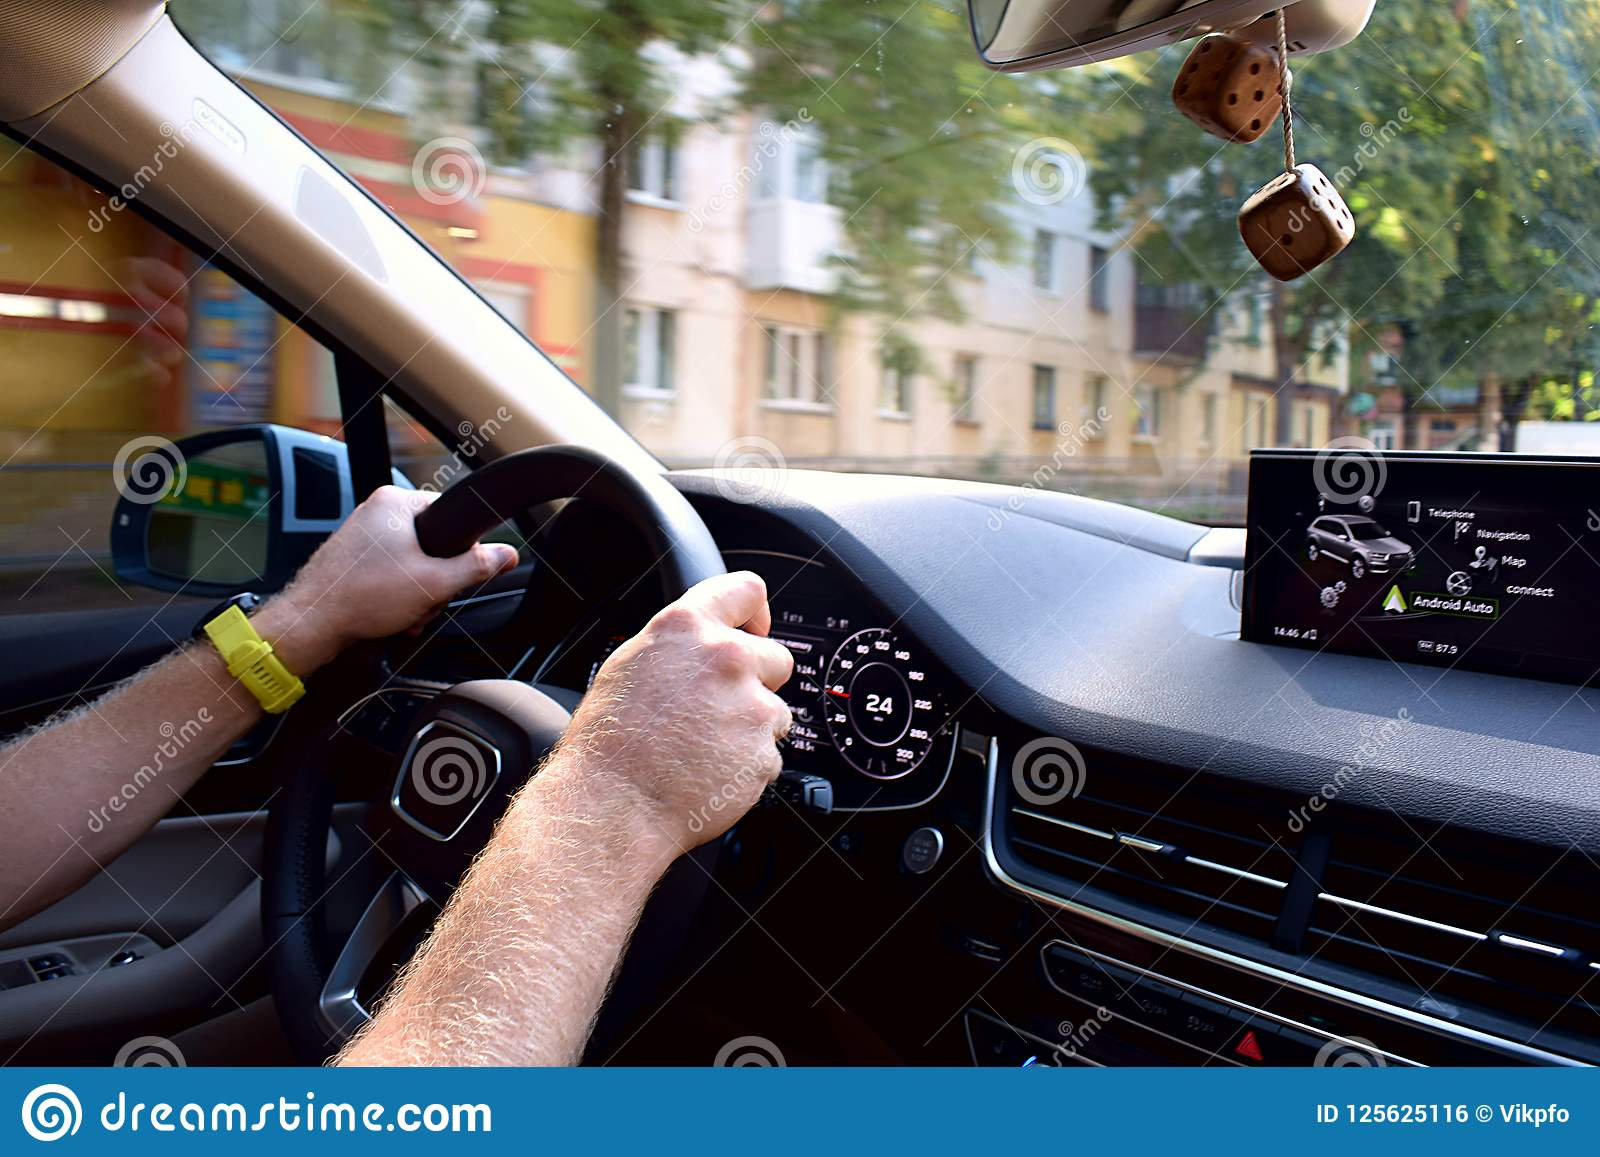 Stuurwiel en dashboard van de auto